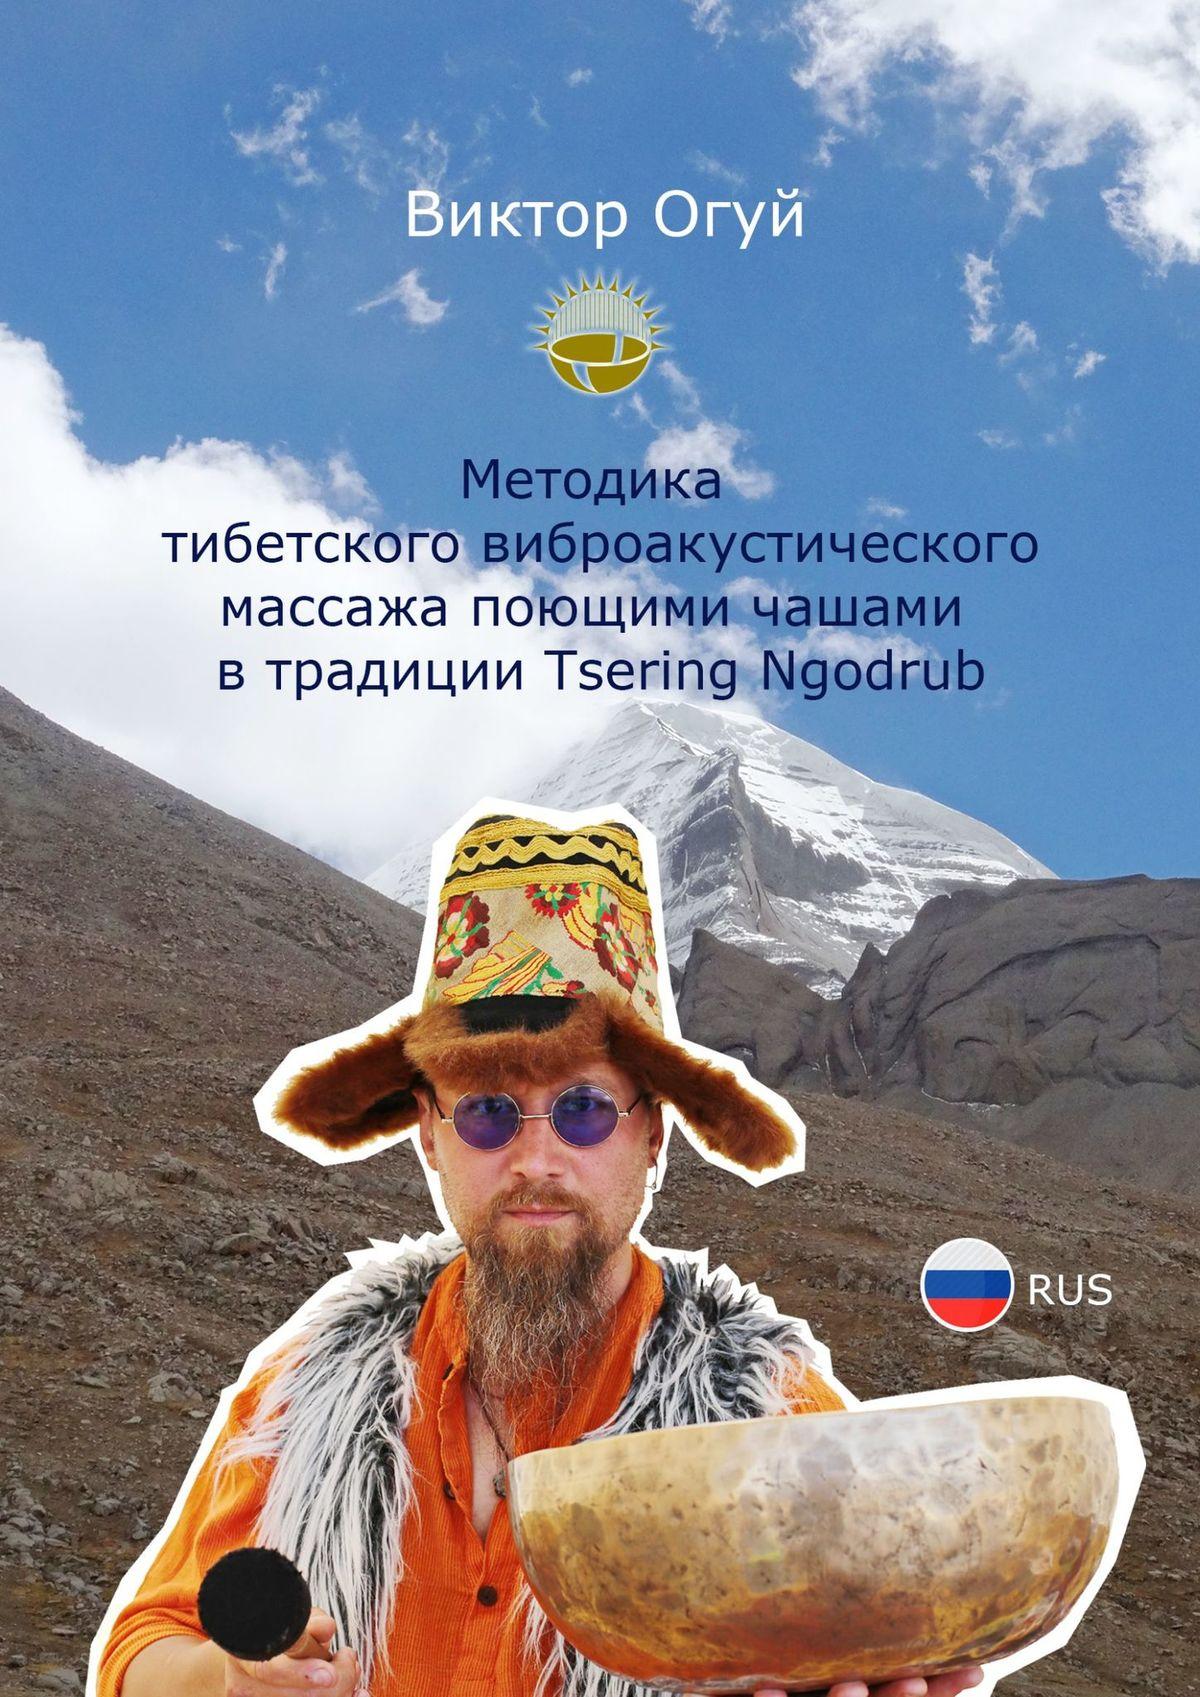 Виктор Олегович Огуй Методика тибетского виброакустического массажа поющими чашами втрадиции Tsering Ngodrub